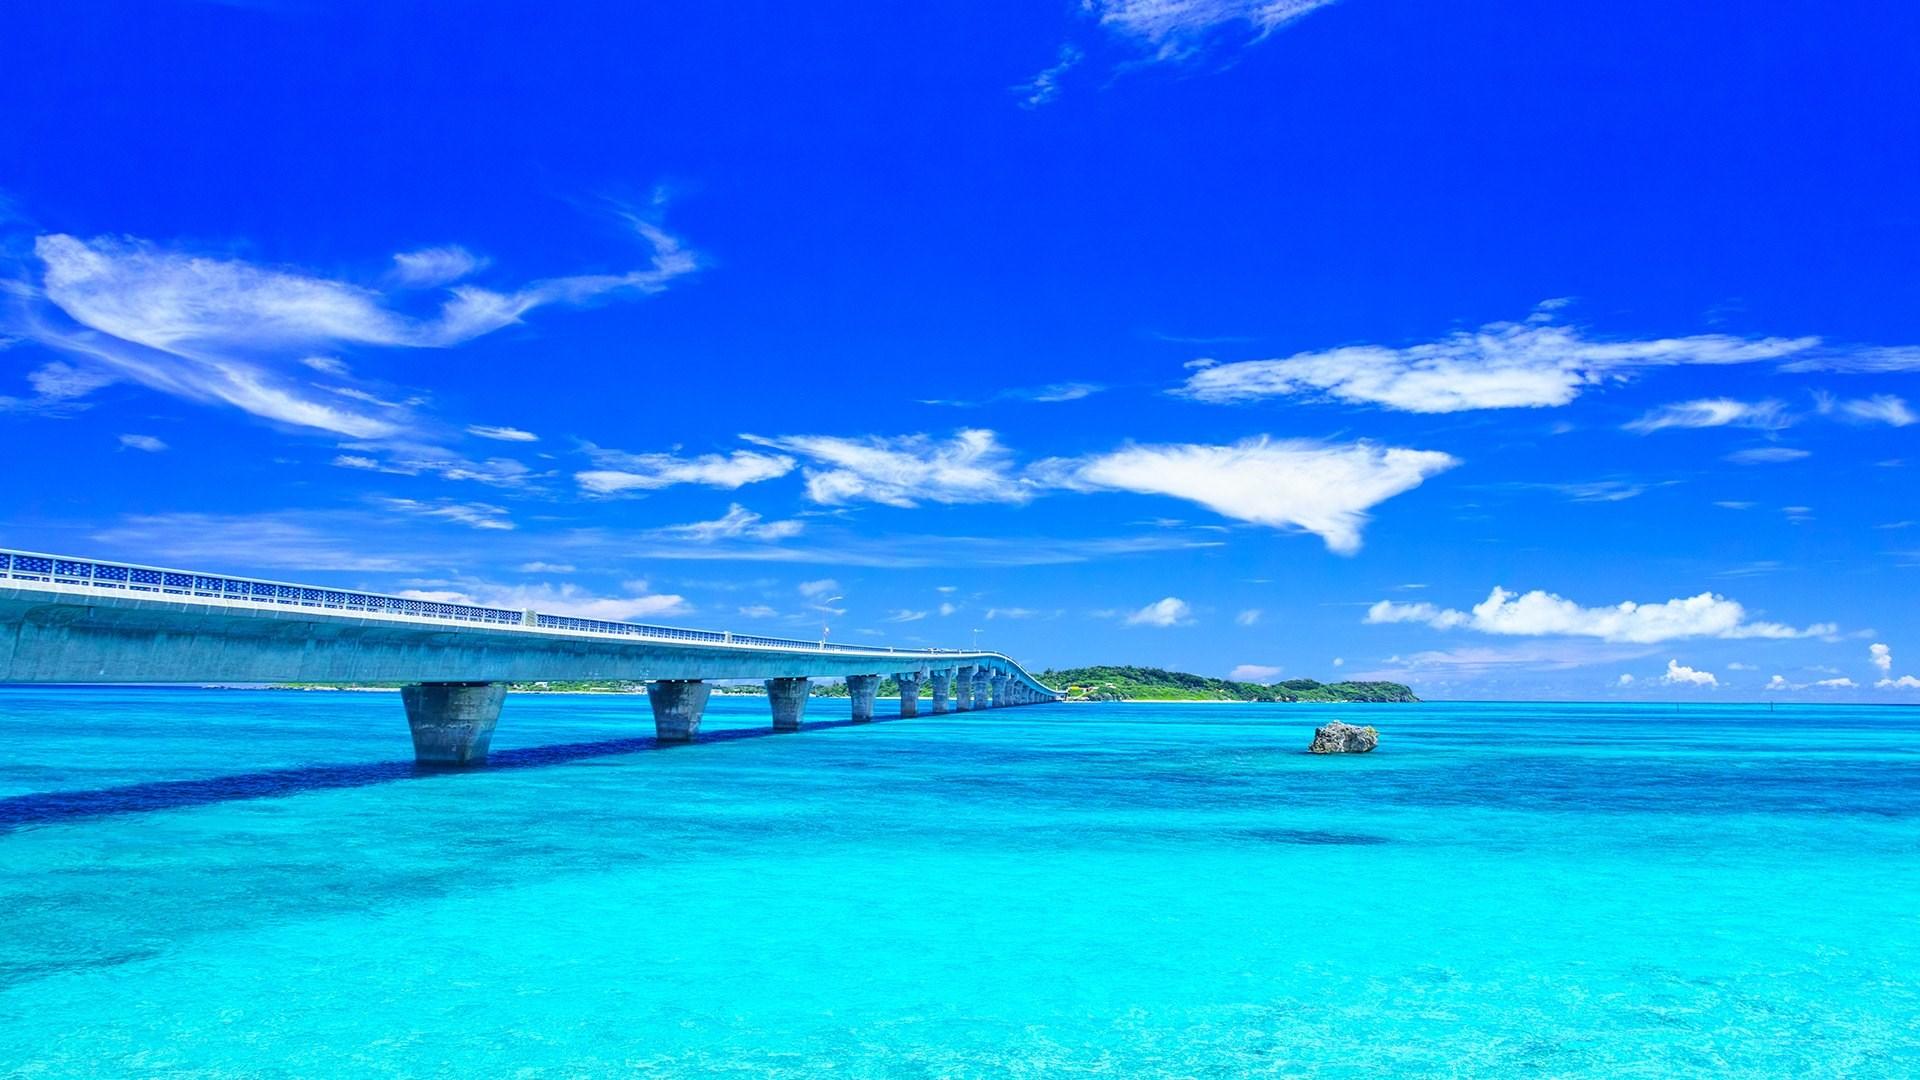 Ikema Ohashi-bridge on the Miyako ...